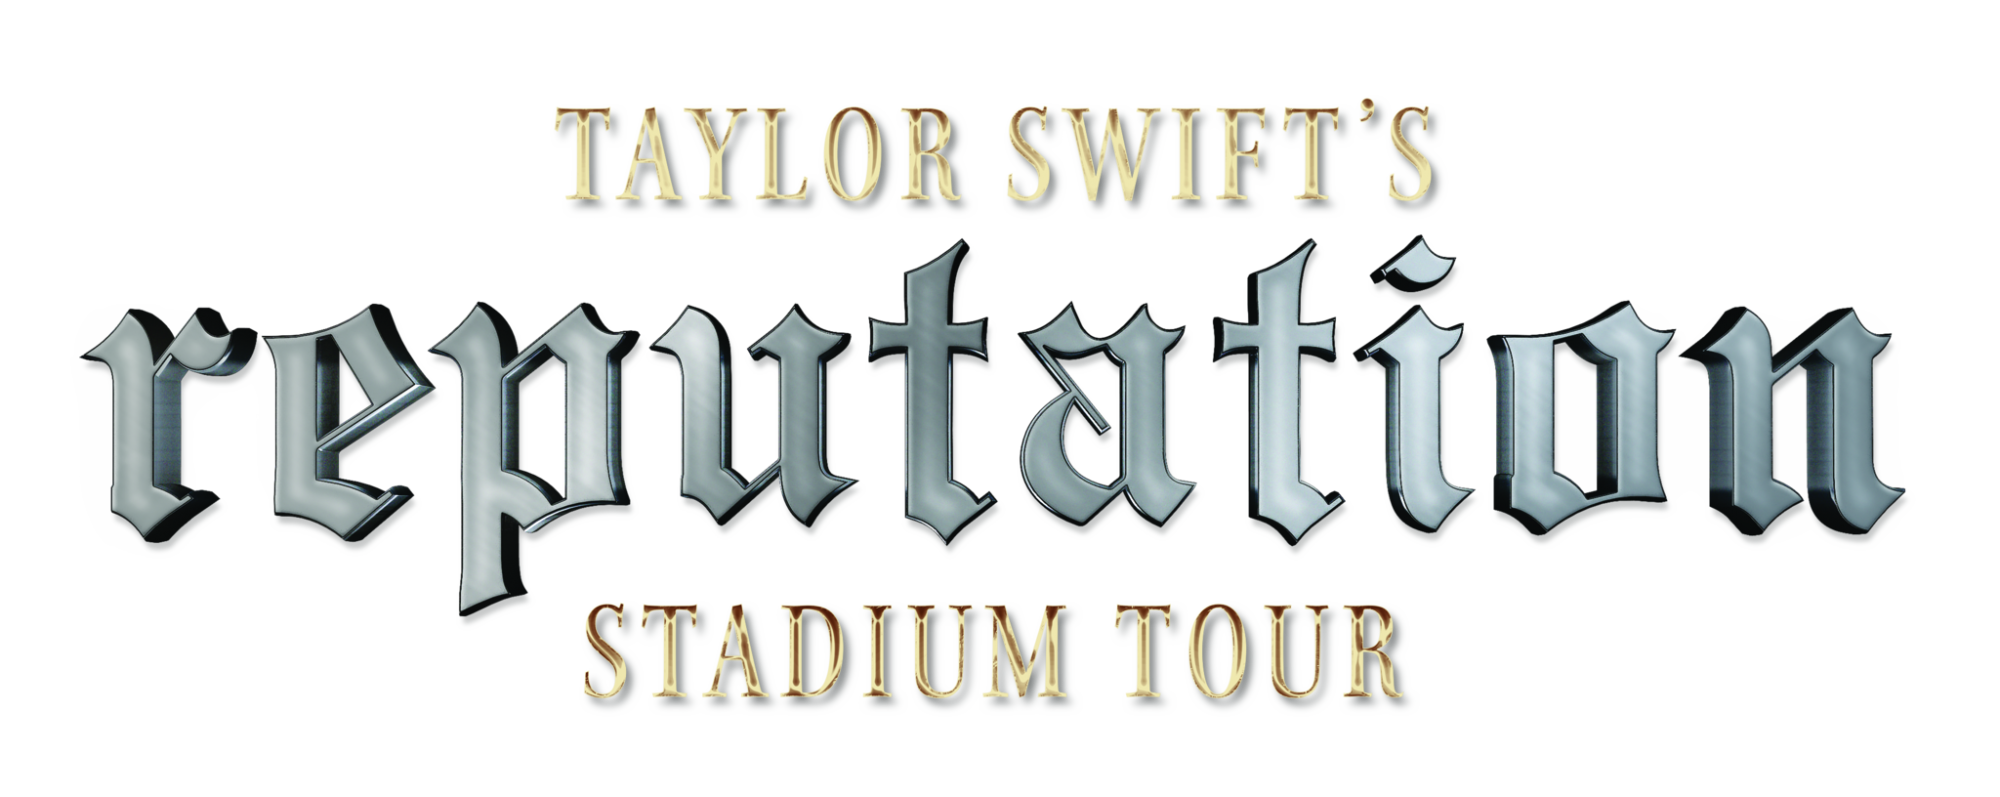 Taylor Swift's Reputation Stadium Tour - Wikipedia, la enciclopedia